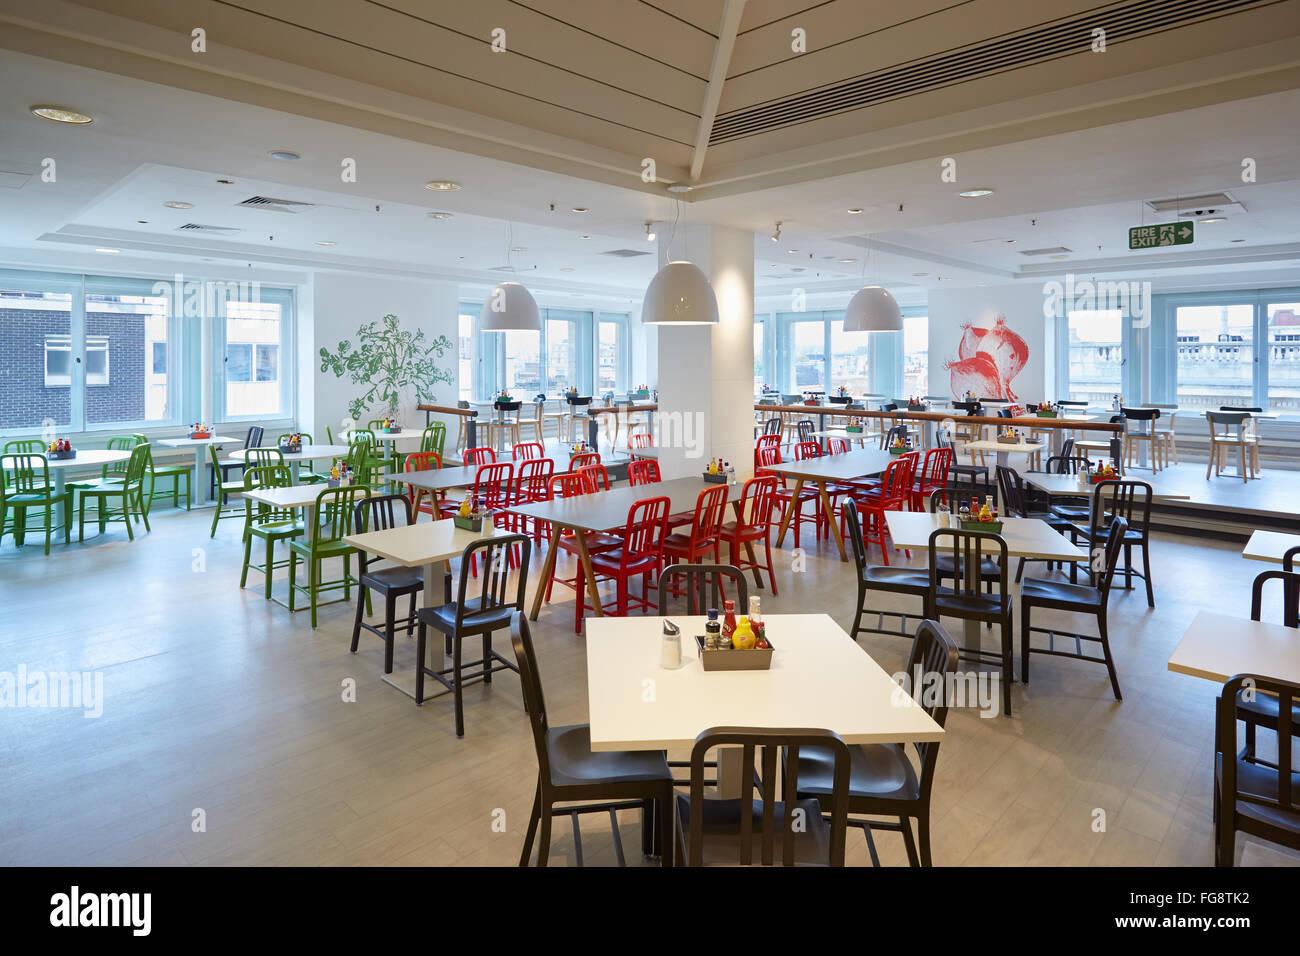 Selfridges department store restaurant interior in london